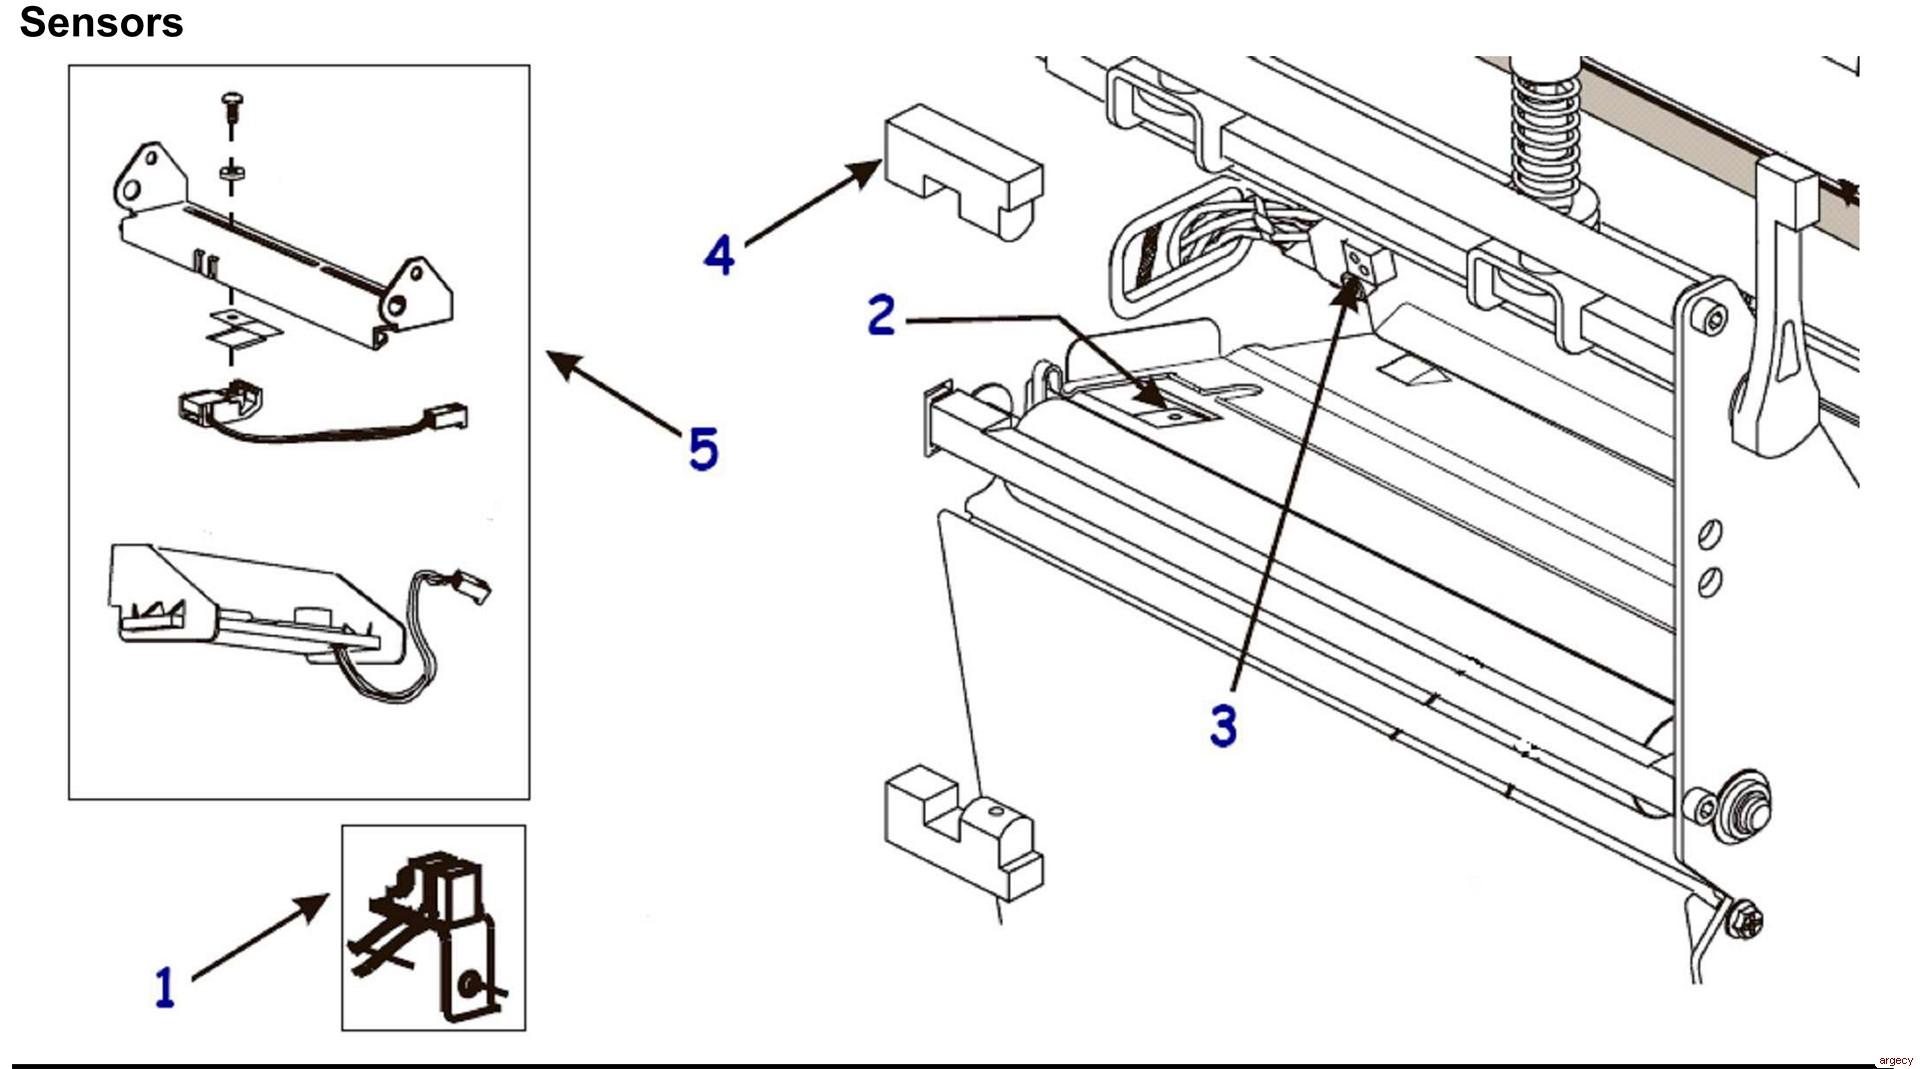 http://www.argecy.com/images/90Xi3Plus_96Xi3Plus_140Xi3Plus_170Xi3Plus_220Xi3Plus_Parts-9_cr.jpg